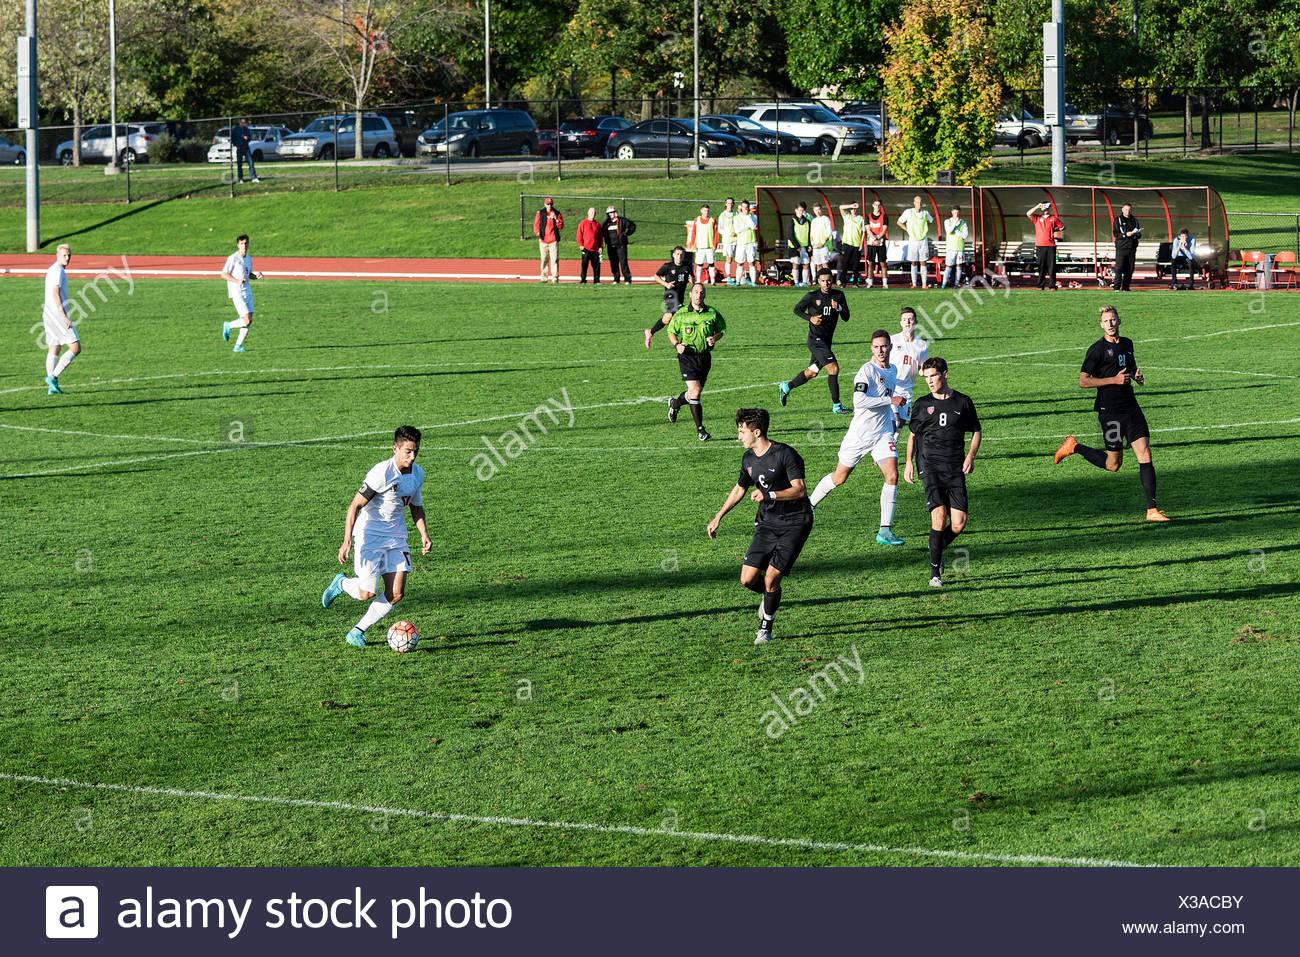 Harvard Vs Cornell Herren Fußball Spiel, Cornell University, Ithaca, New York, USA Stockfoto